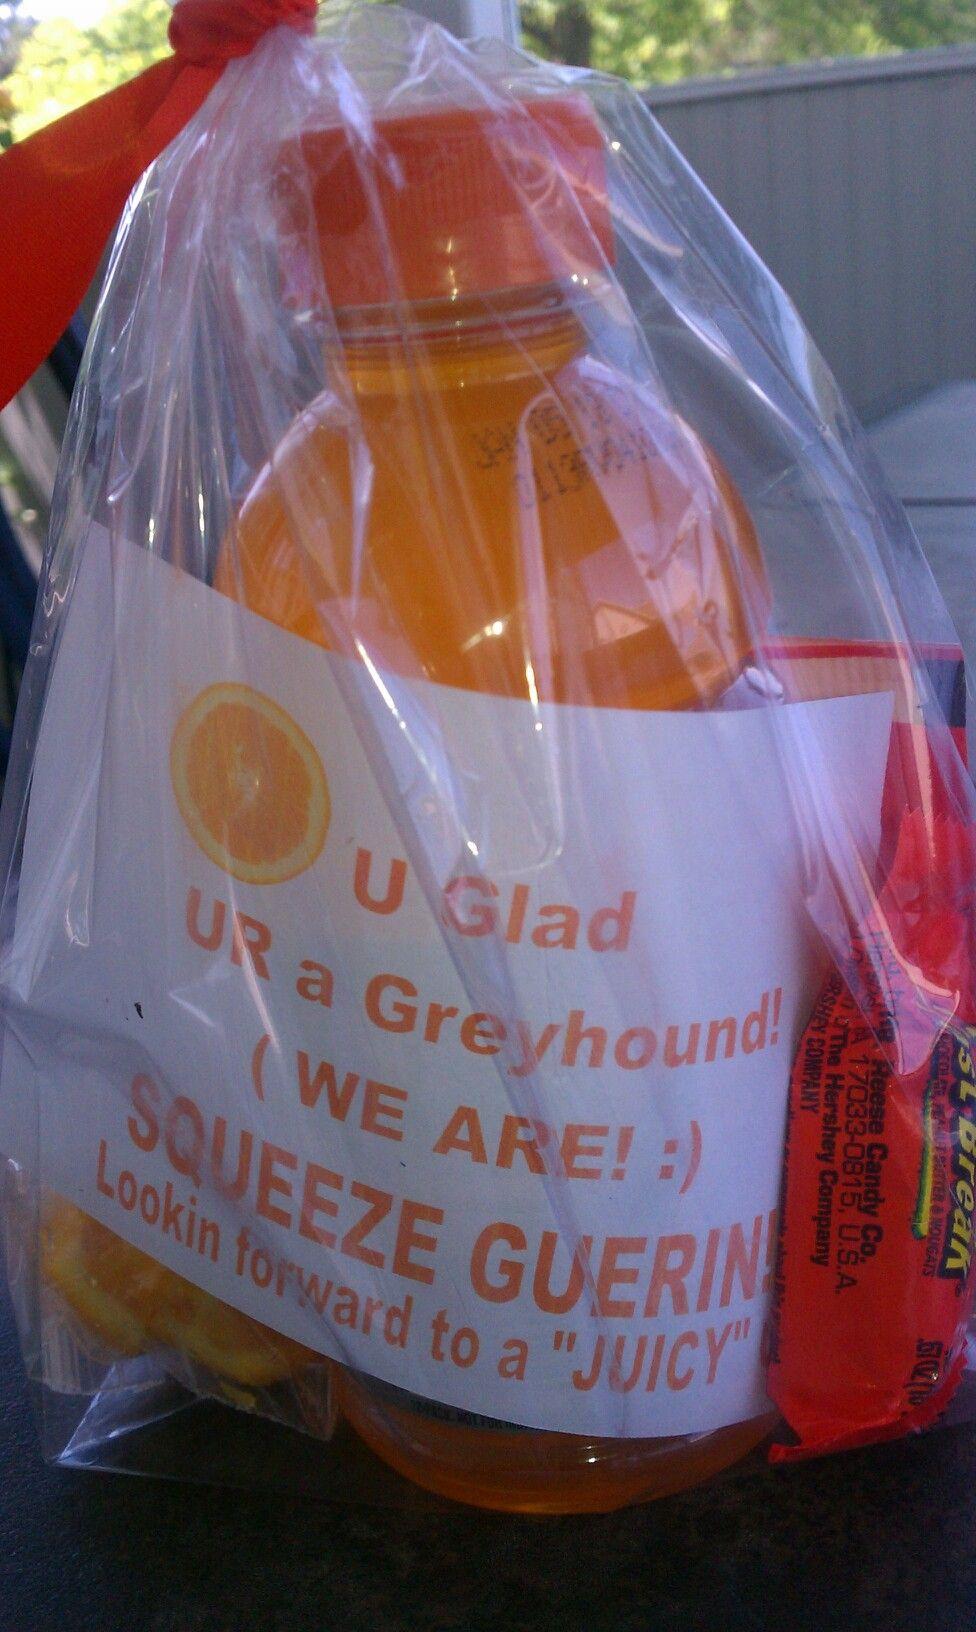 Team Treats.orange Gatorade Orange Slices Cuties